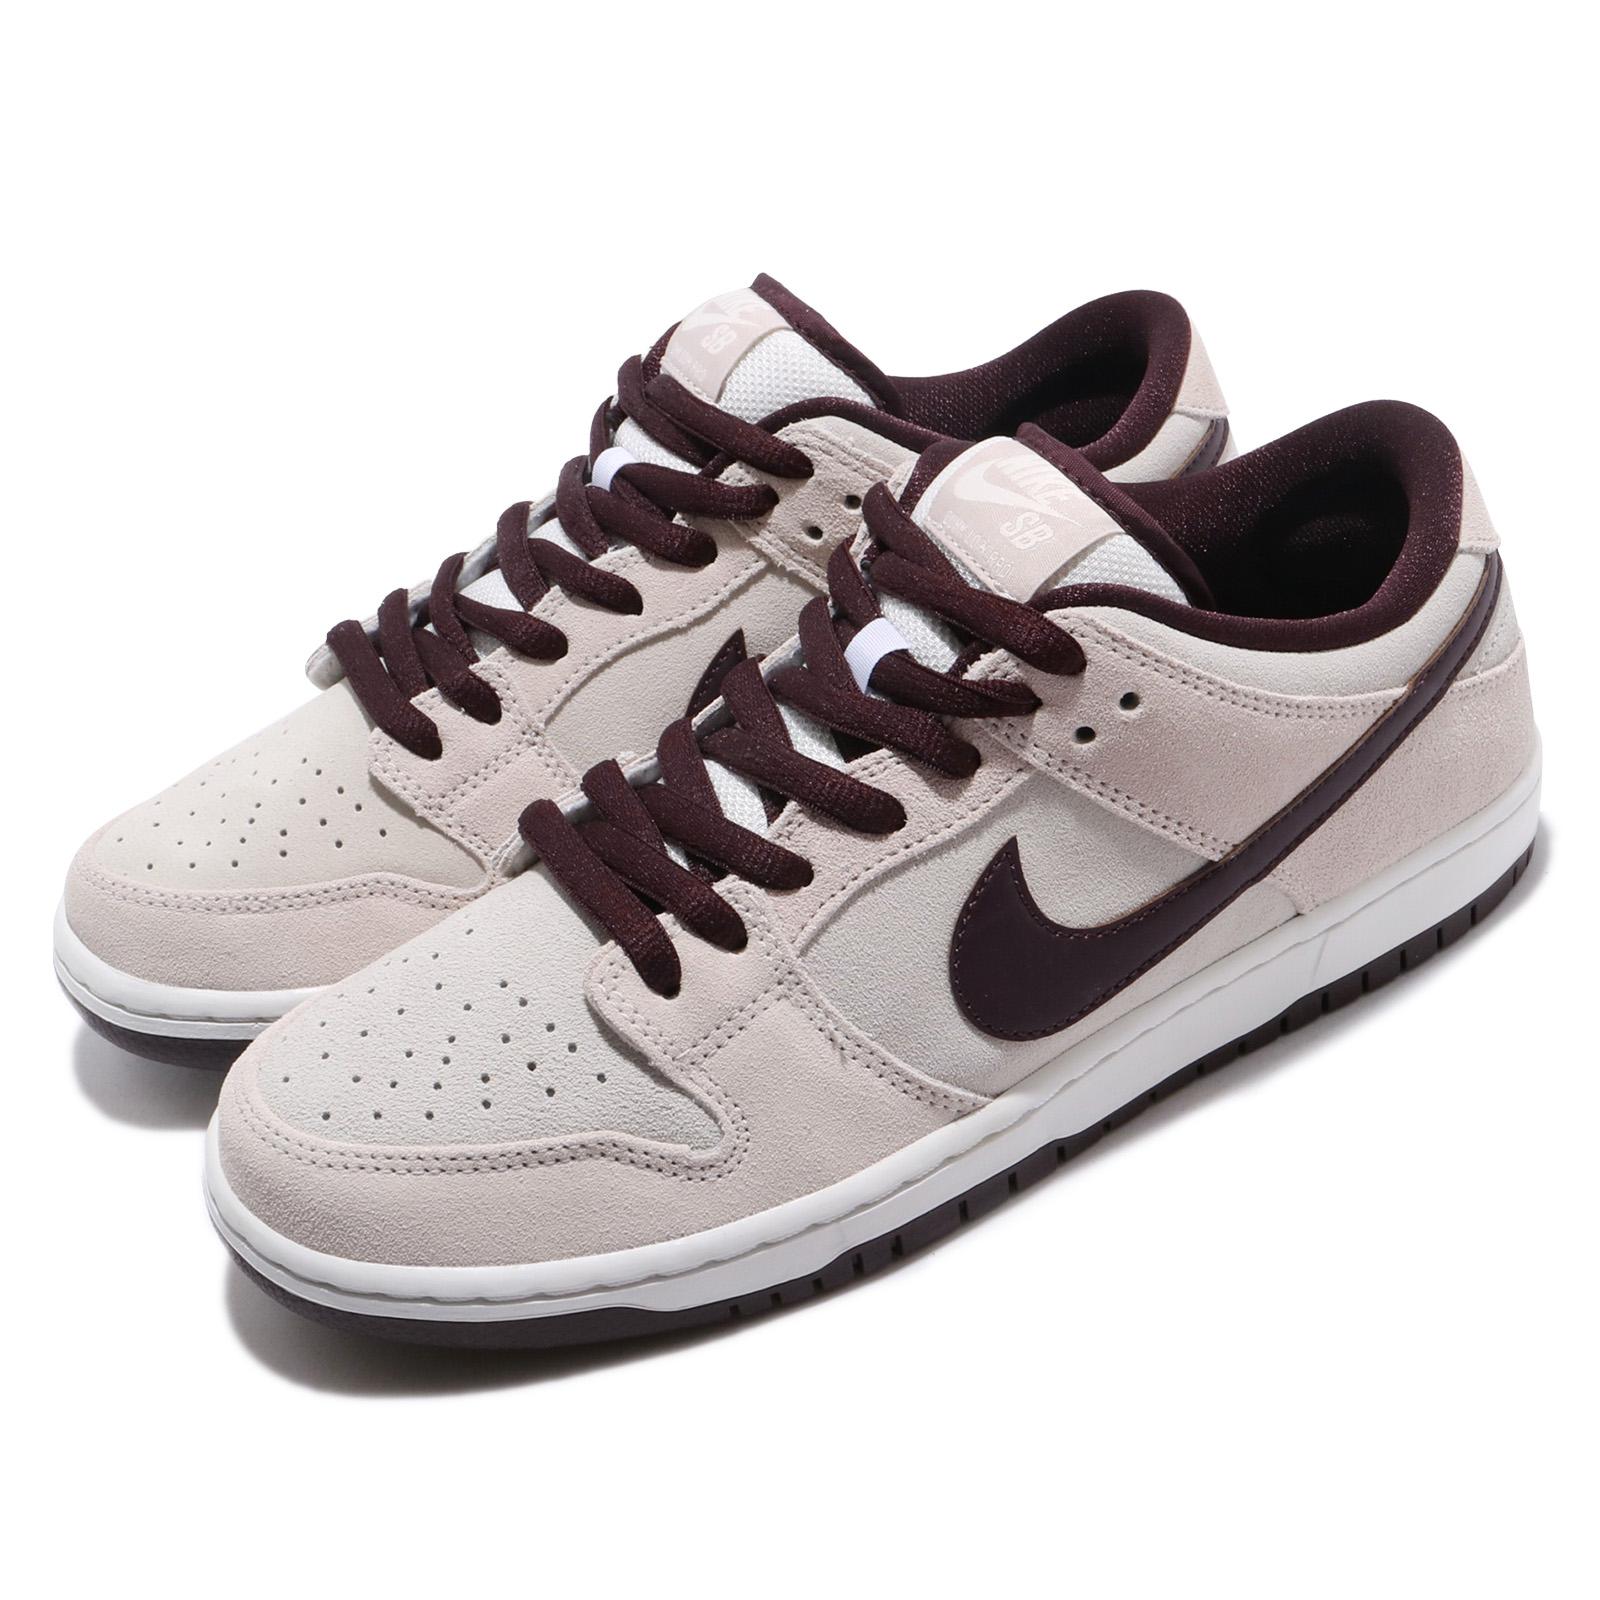 Nike 滑板鞋 SB Dunk Low Pro 男鞋 BQ6817-004